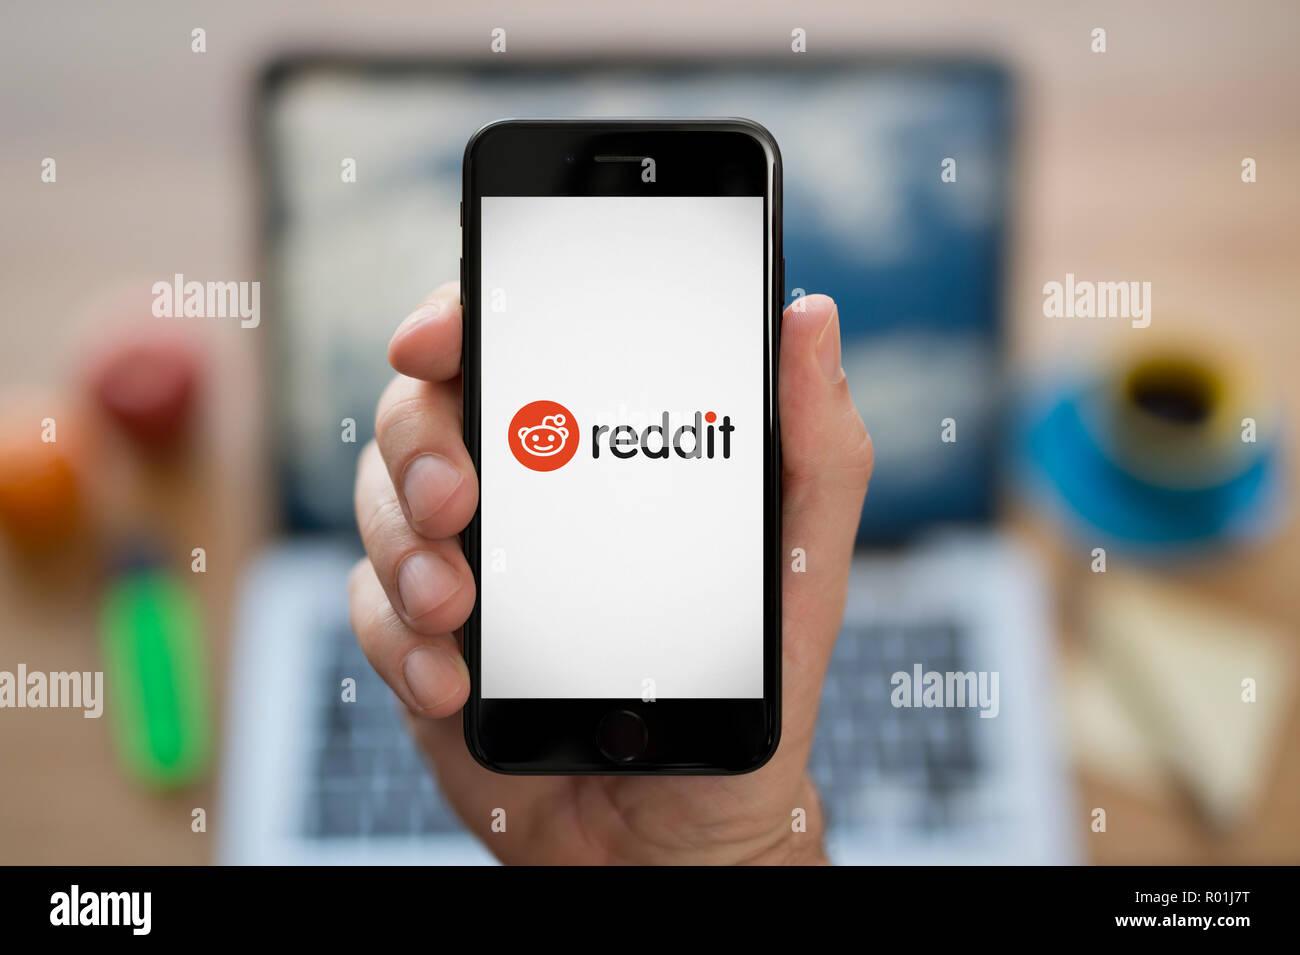 Reddit Mobile App Stock Photos & Reddit Mobile App Stock Images - Alamy